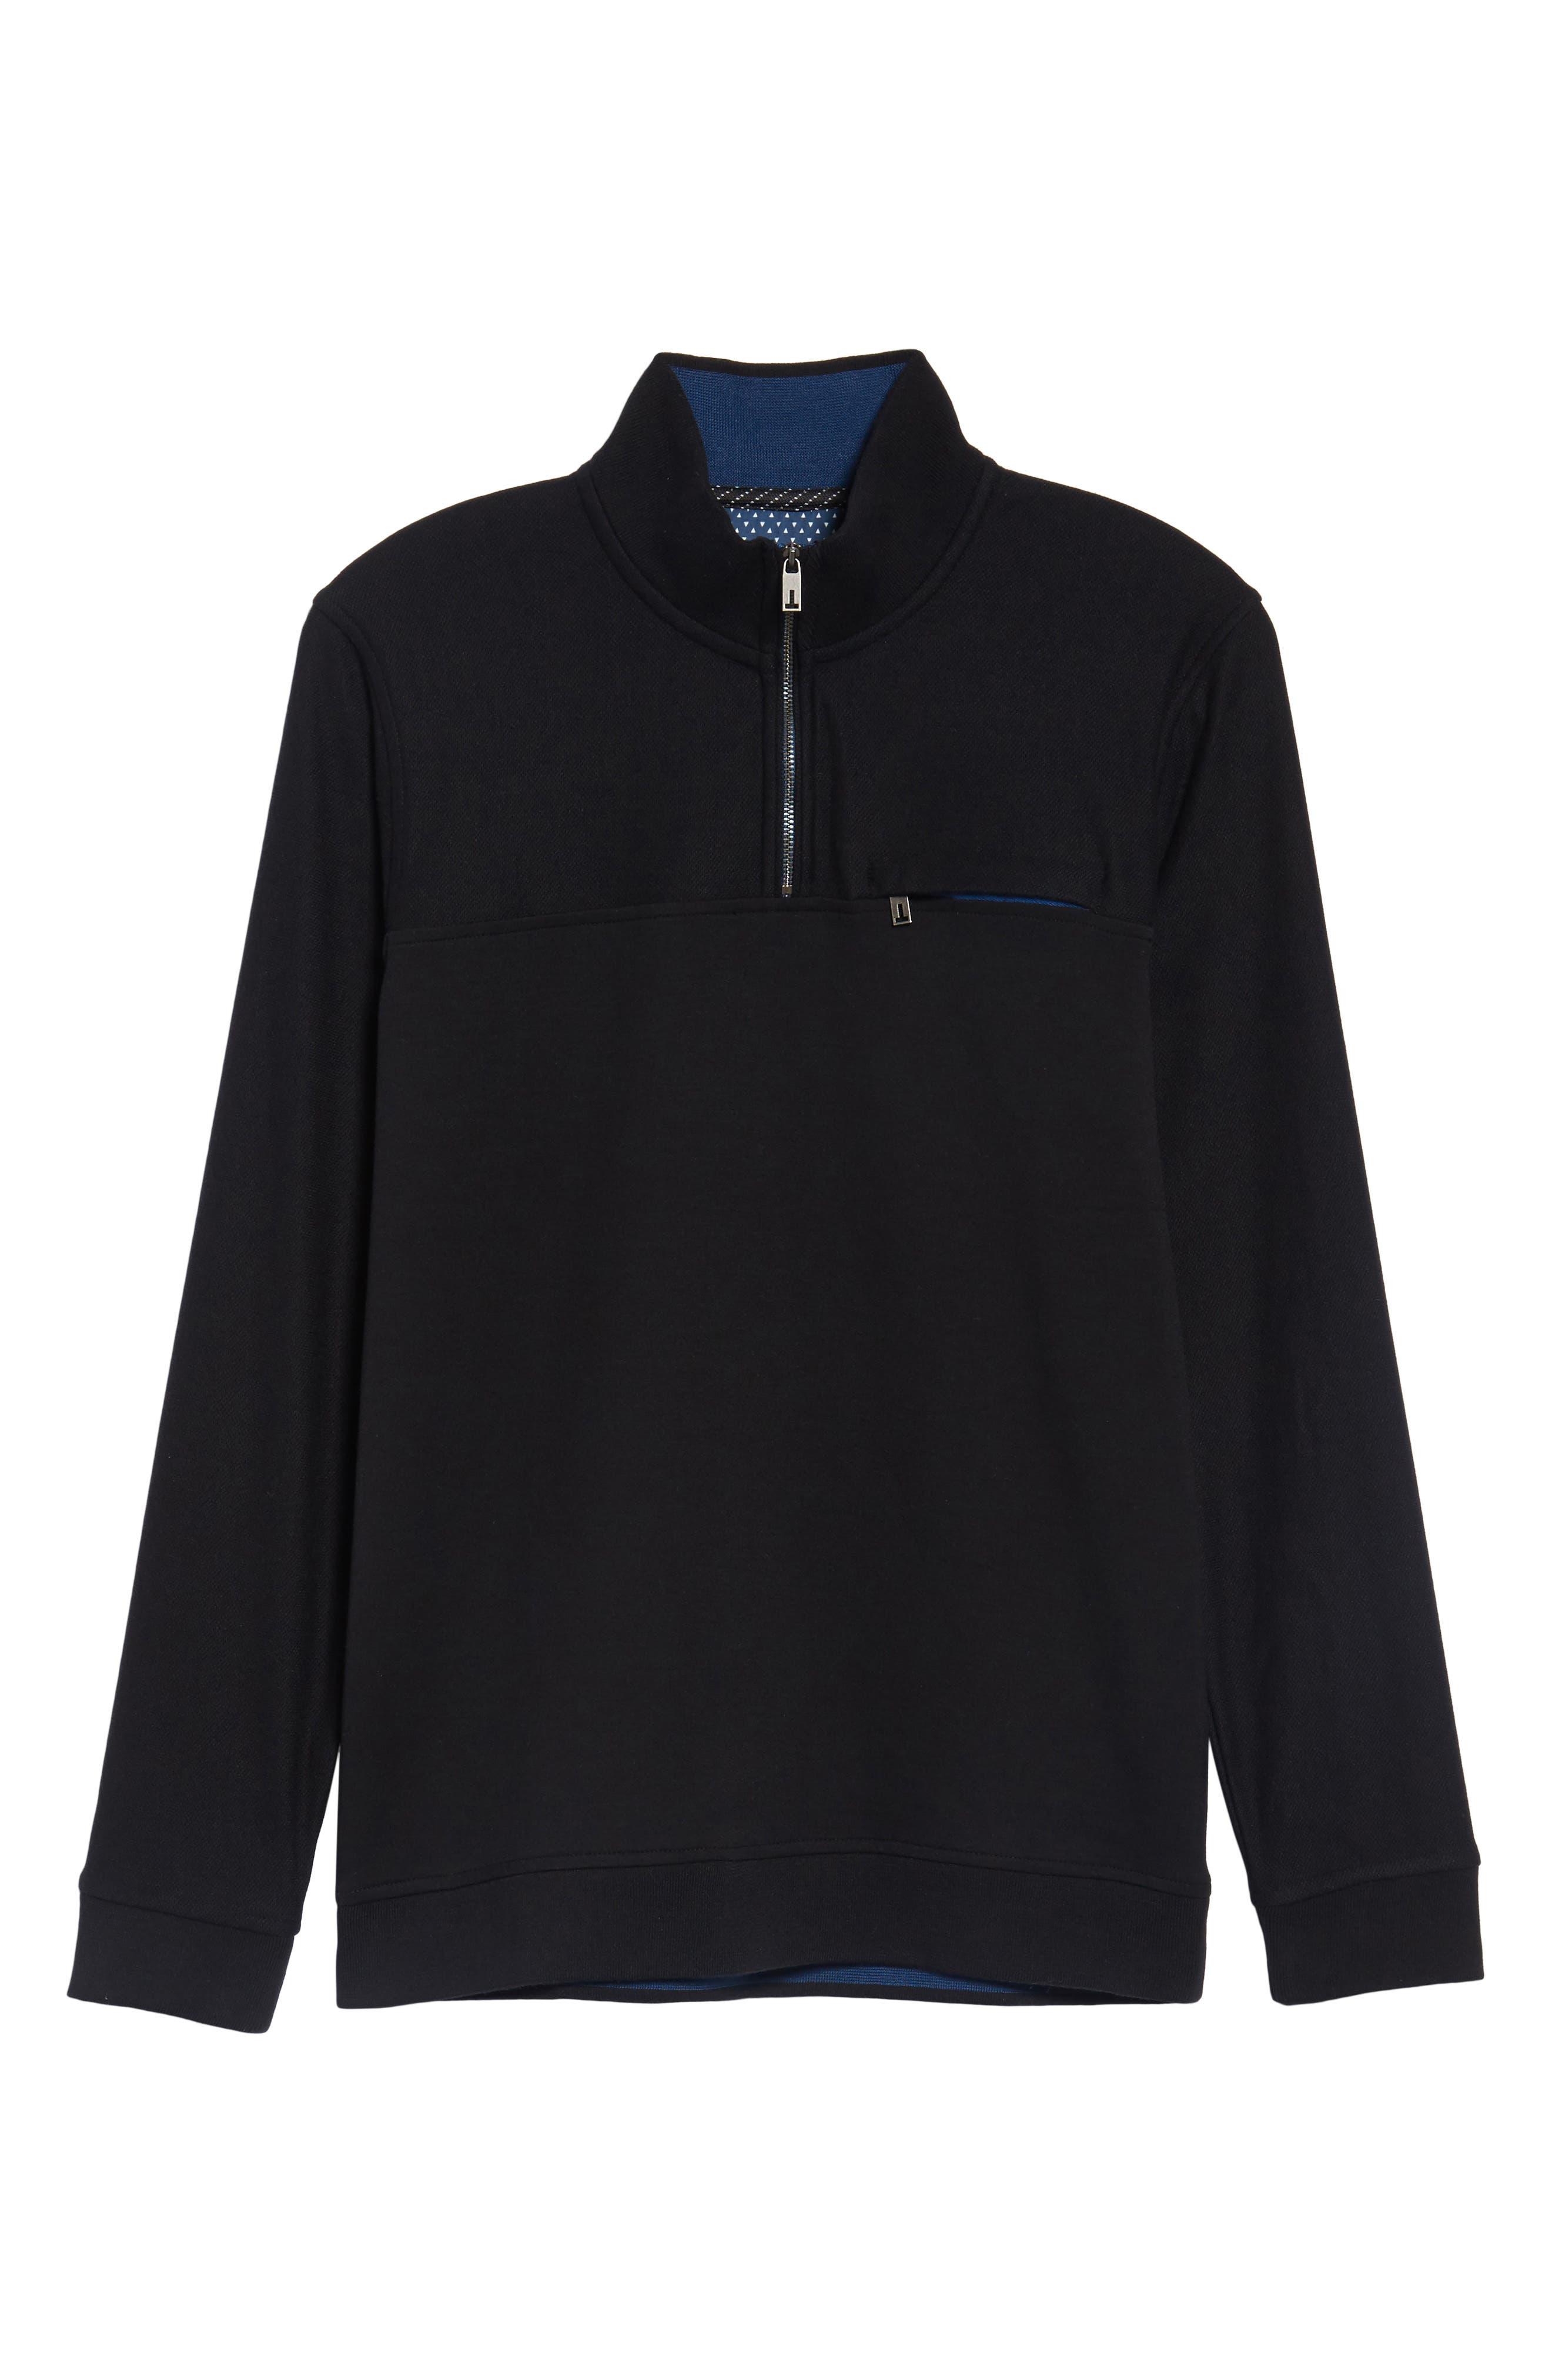 Livstay Slim Fit Quarter Zip Pullover,                             Alternate thumbnail 6, color,                             001